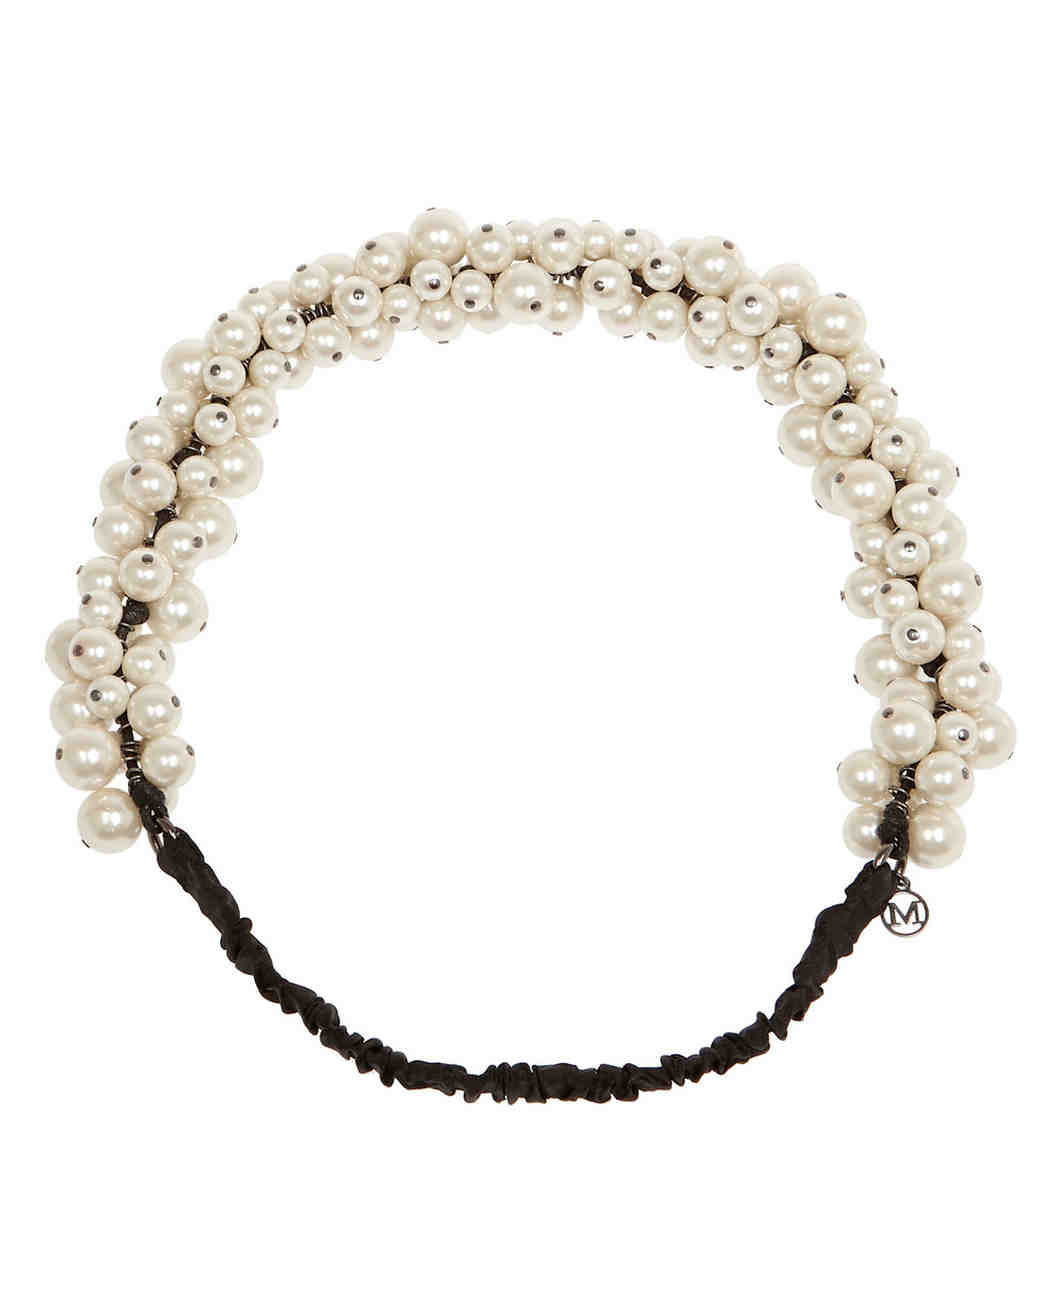 hair-accessories-maison-michel-astrid-headband-1014.jpg